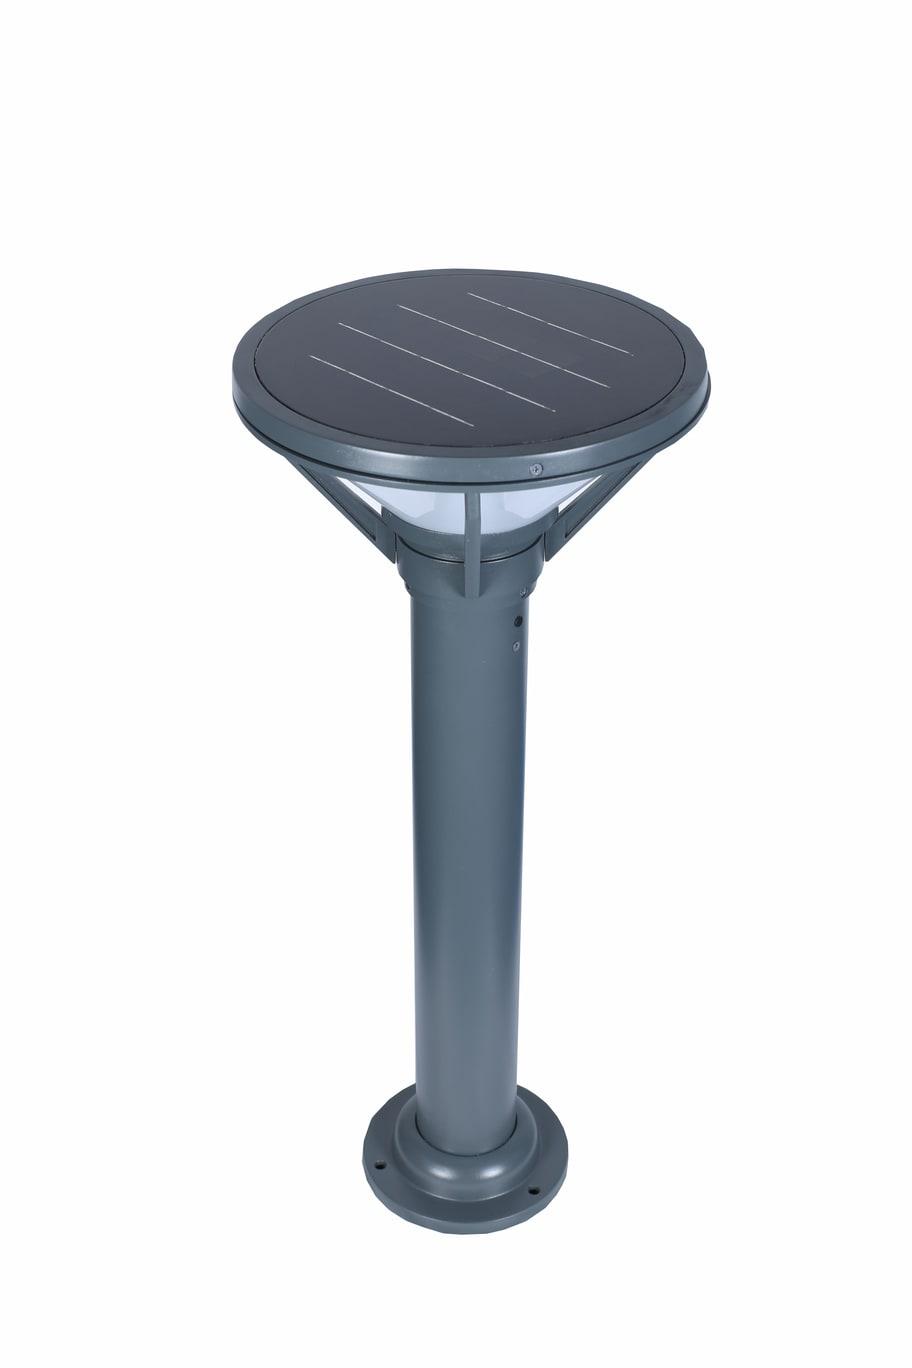 SolarPower Sus mayores ventajas